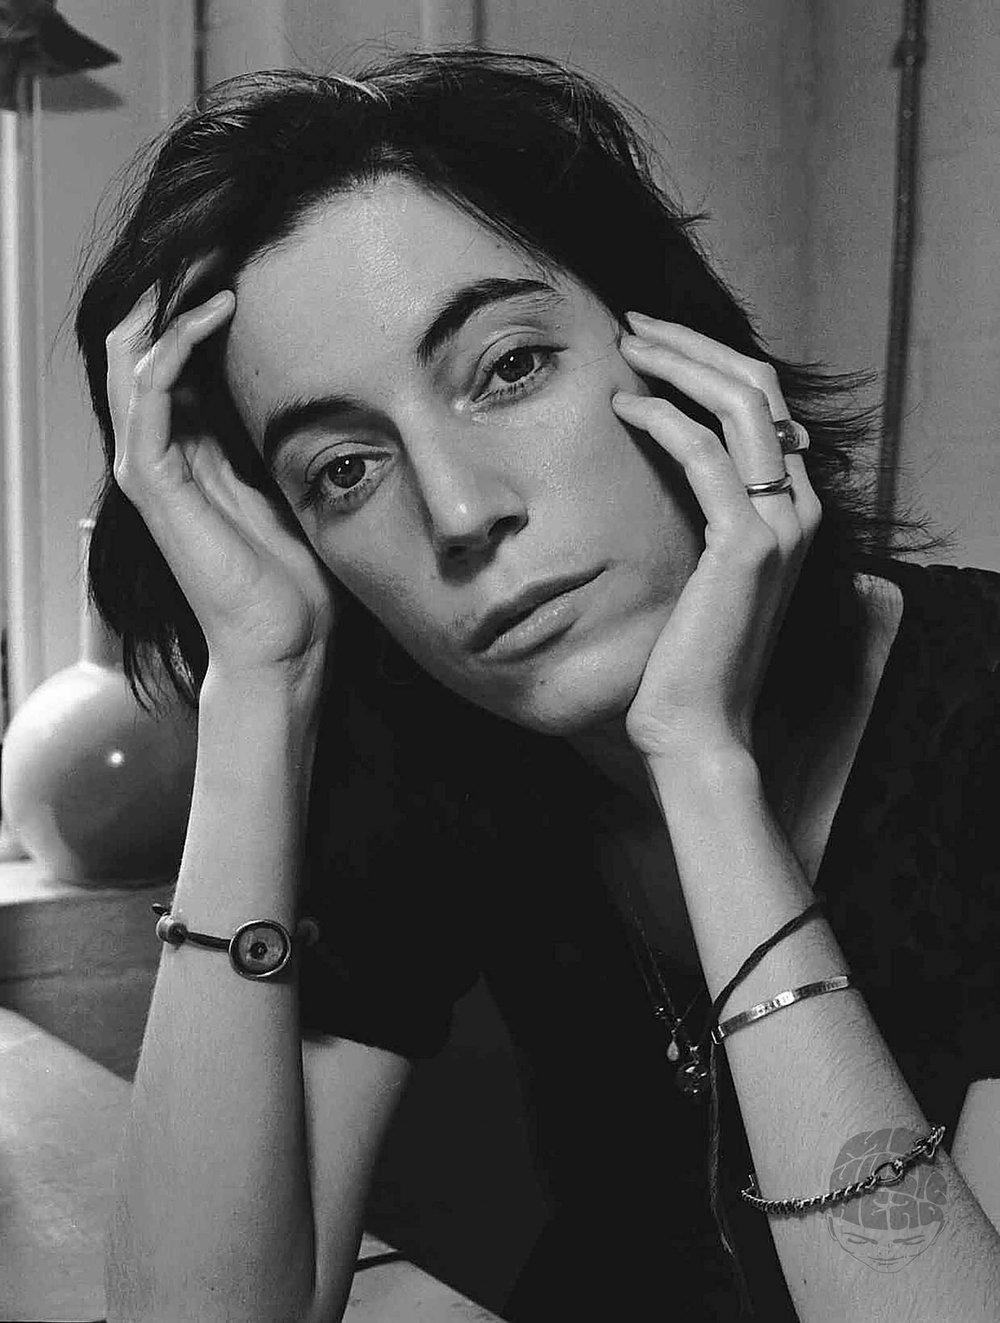 frank stefanko_Patti Smith_Vogue-2.jpg